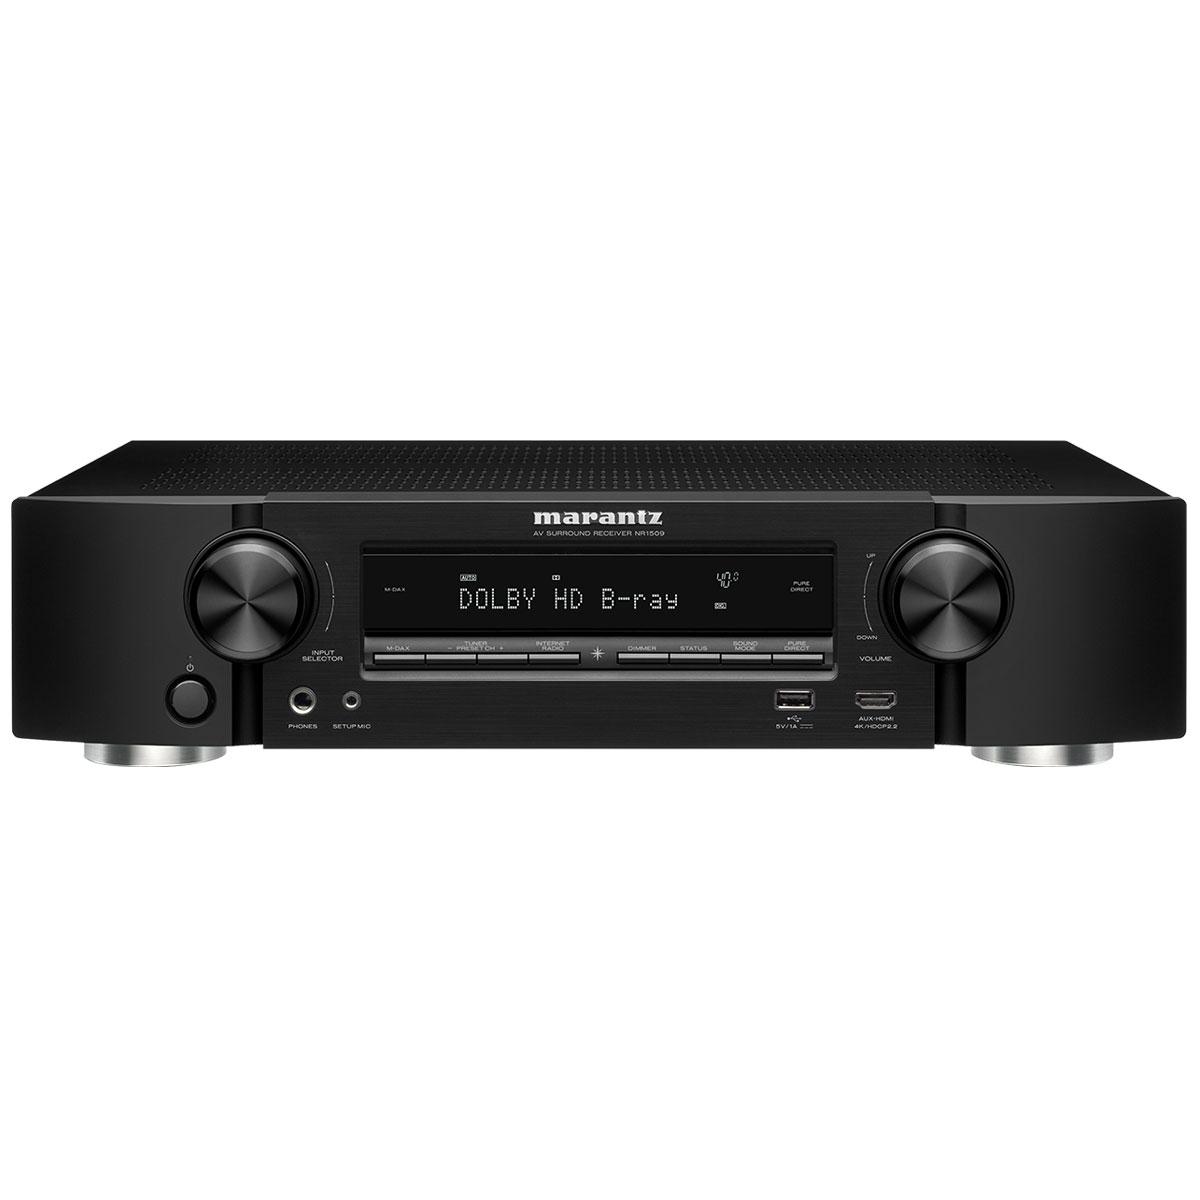 Ampli home cinéma Marantz NR1509 Noir Ampli-tuner Home Cinema Slim 3D Ready 5.2 - Dolby TrueHD / DTS-HD Master Audio - 6x HDMI 4K UHD, HDCP 2.2, HDR - Multiroom - Wi-Fi/Bluetooth/AirPlay 2 - Amazon Alexa